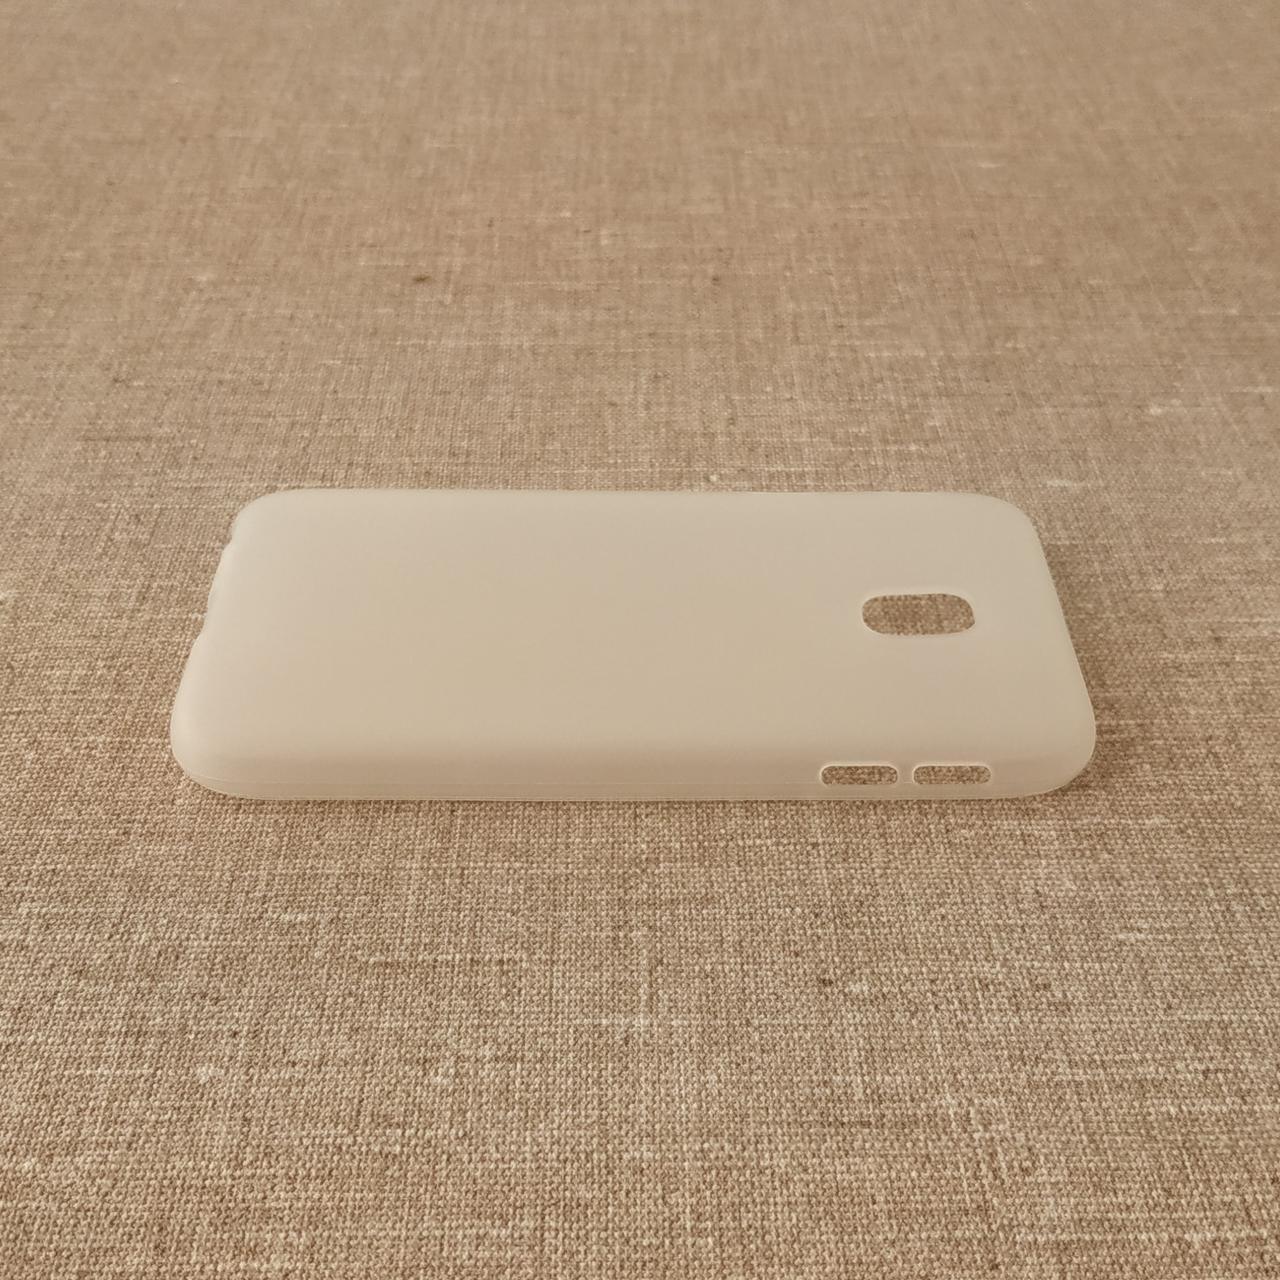 Чехлы для Samsung Galaxy J3 (2017) J330F TPU J330 white (J330) 2017 Для телефона Белый